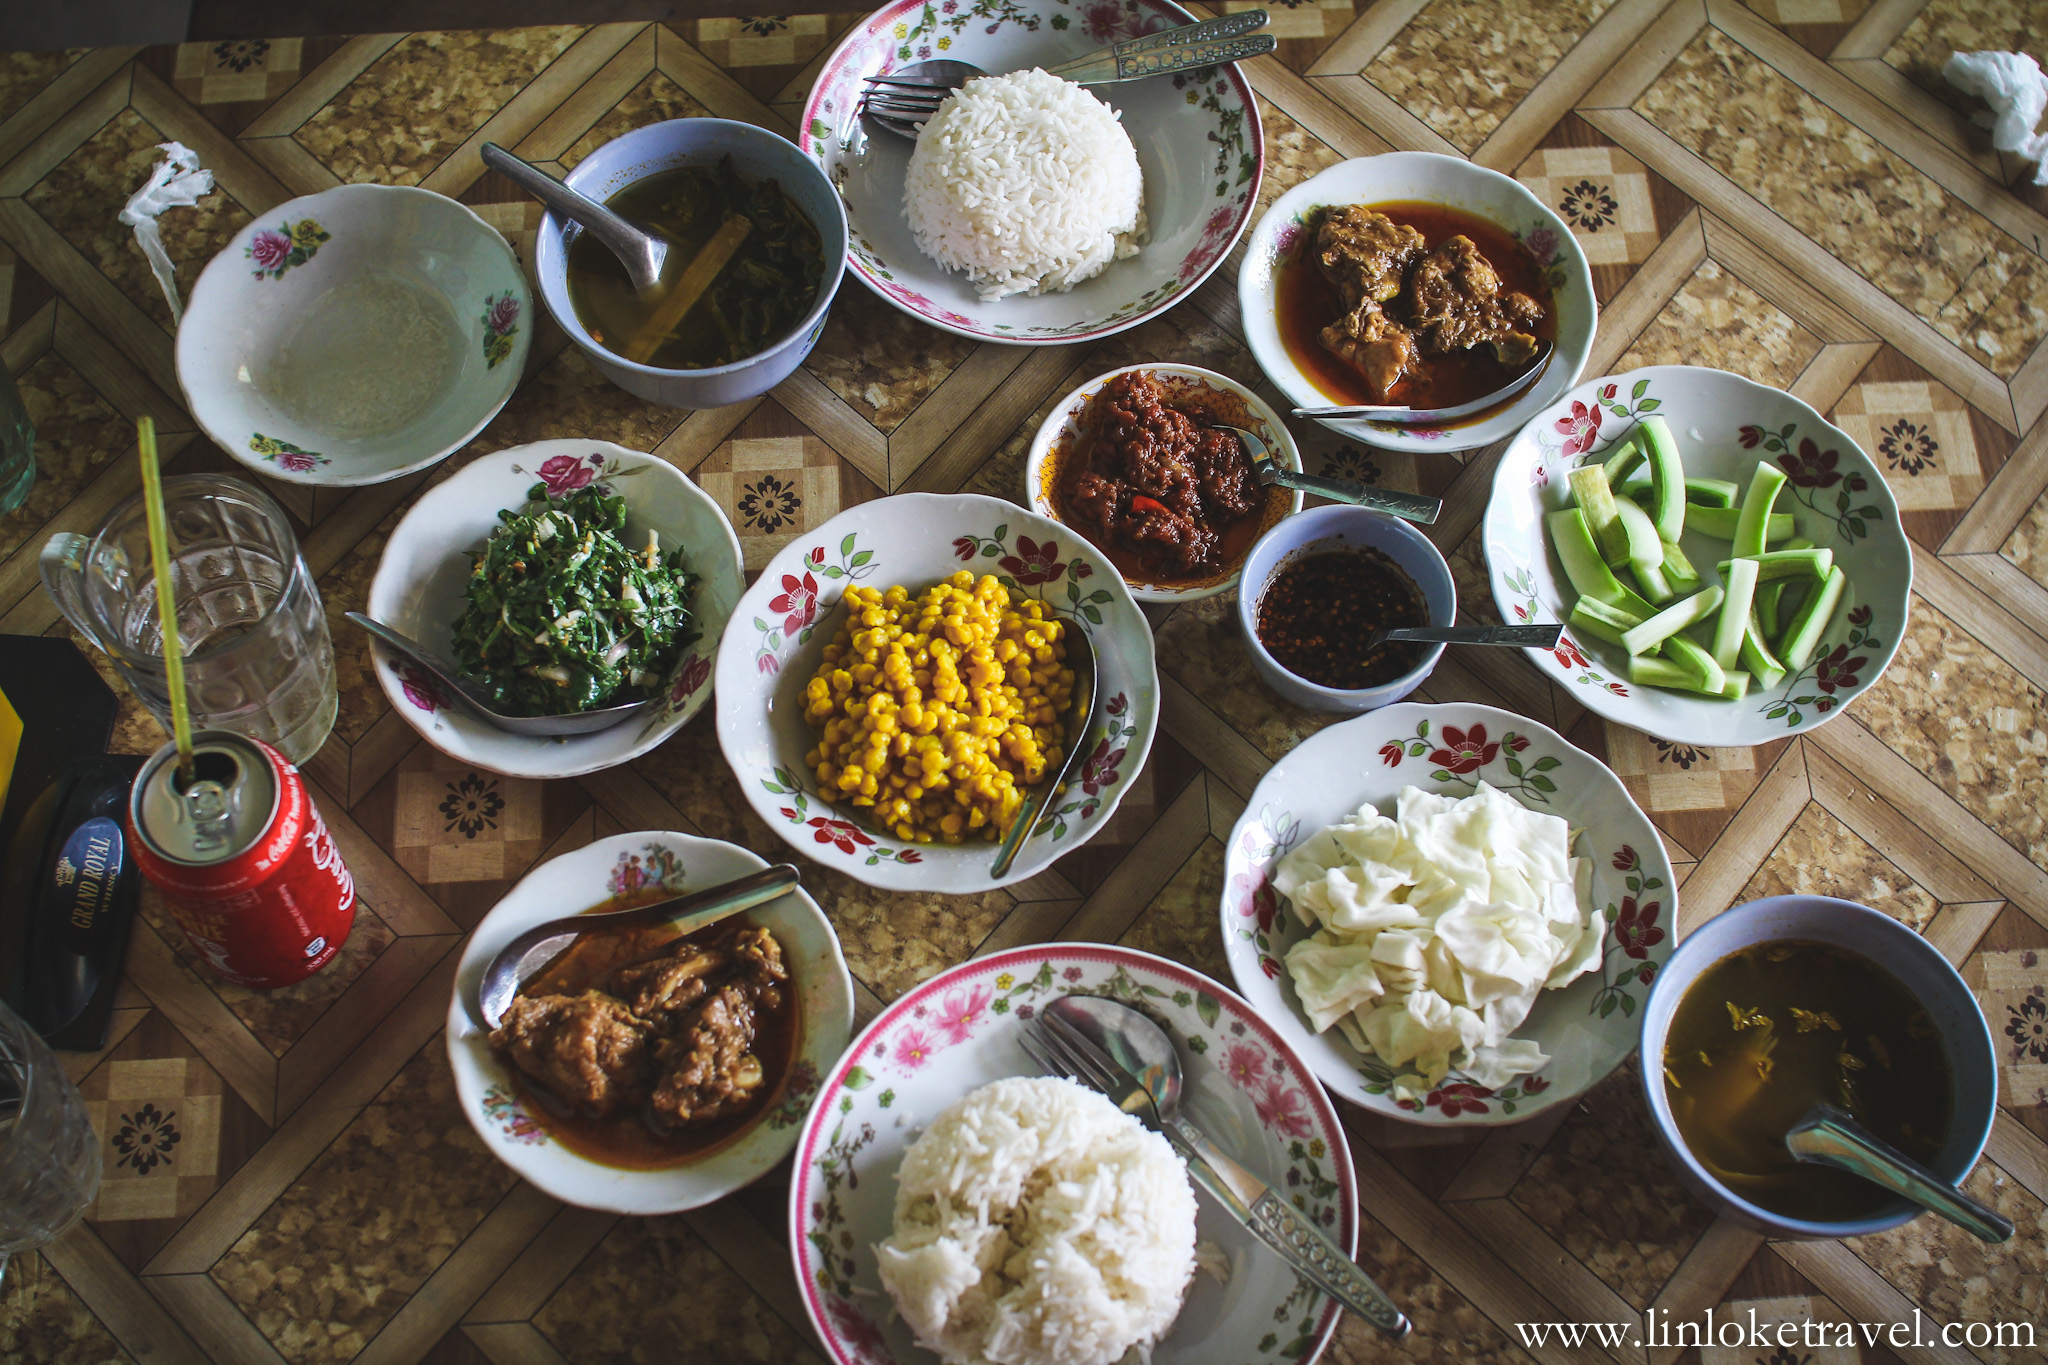 Traditional Burmese food at Shwe Myat Tar